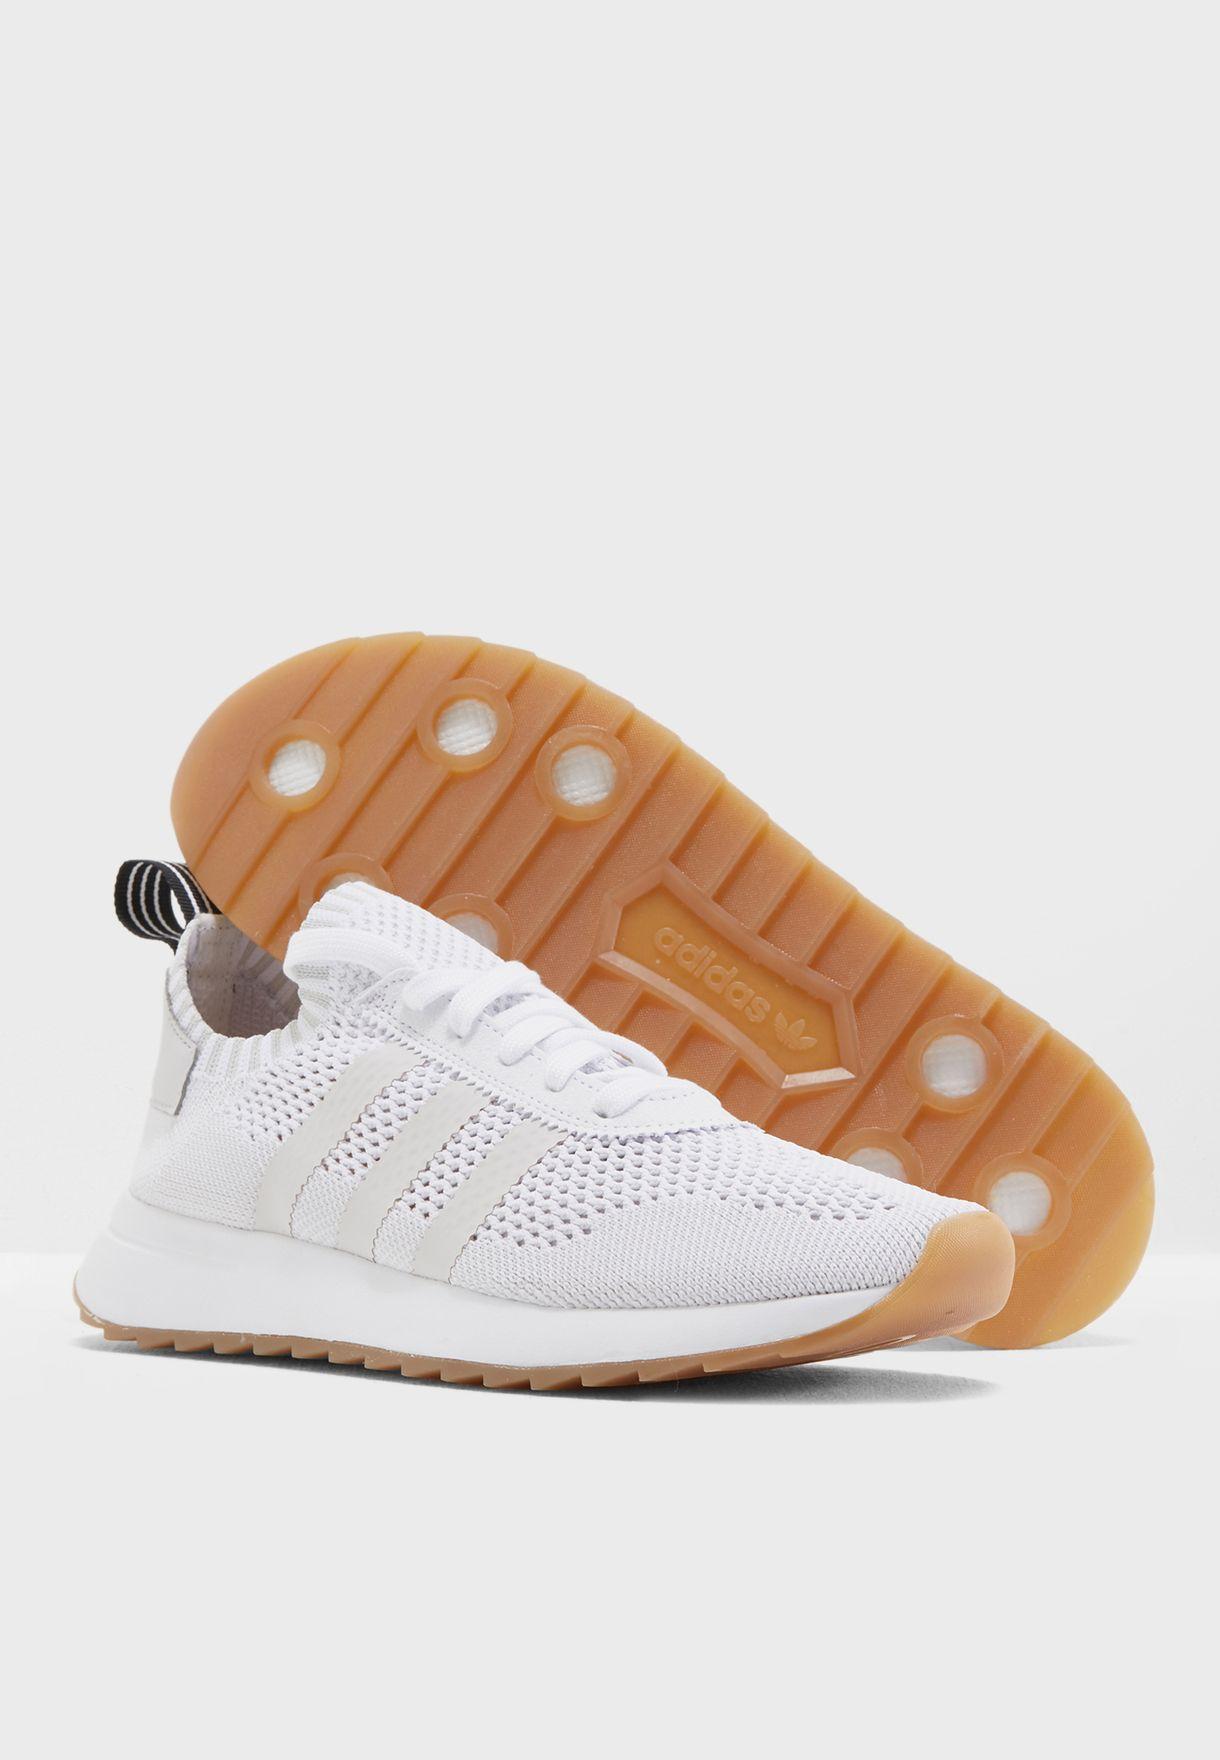 aceb88bc0e9644 Shop adidas Originals white FLB Runner PK CQ1986 for Women in ...